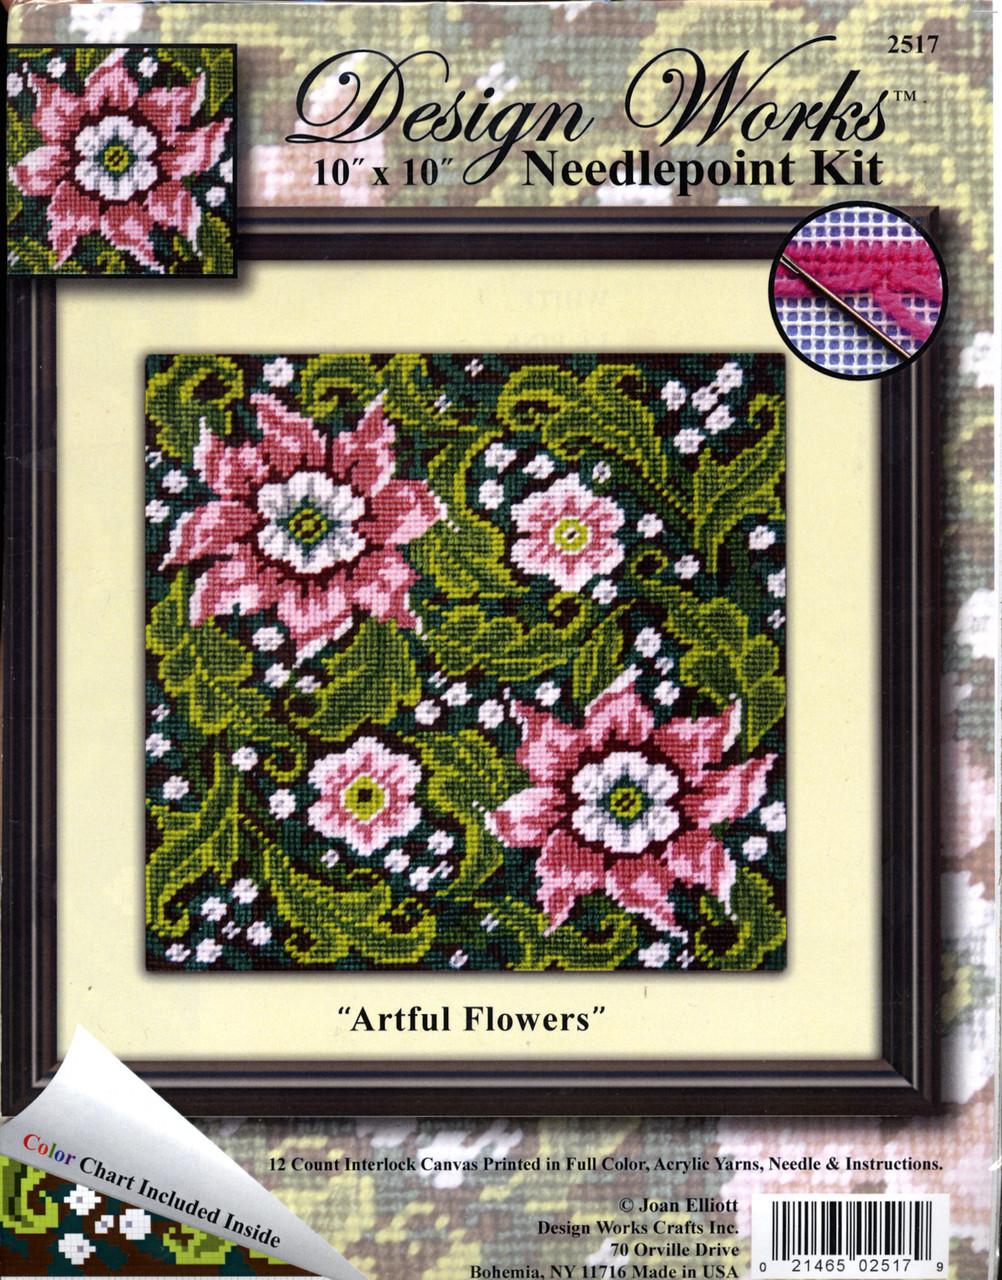 Design Works - Artful Flowers